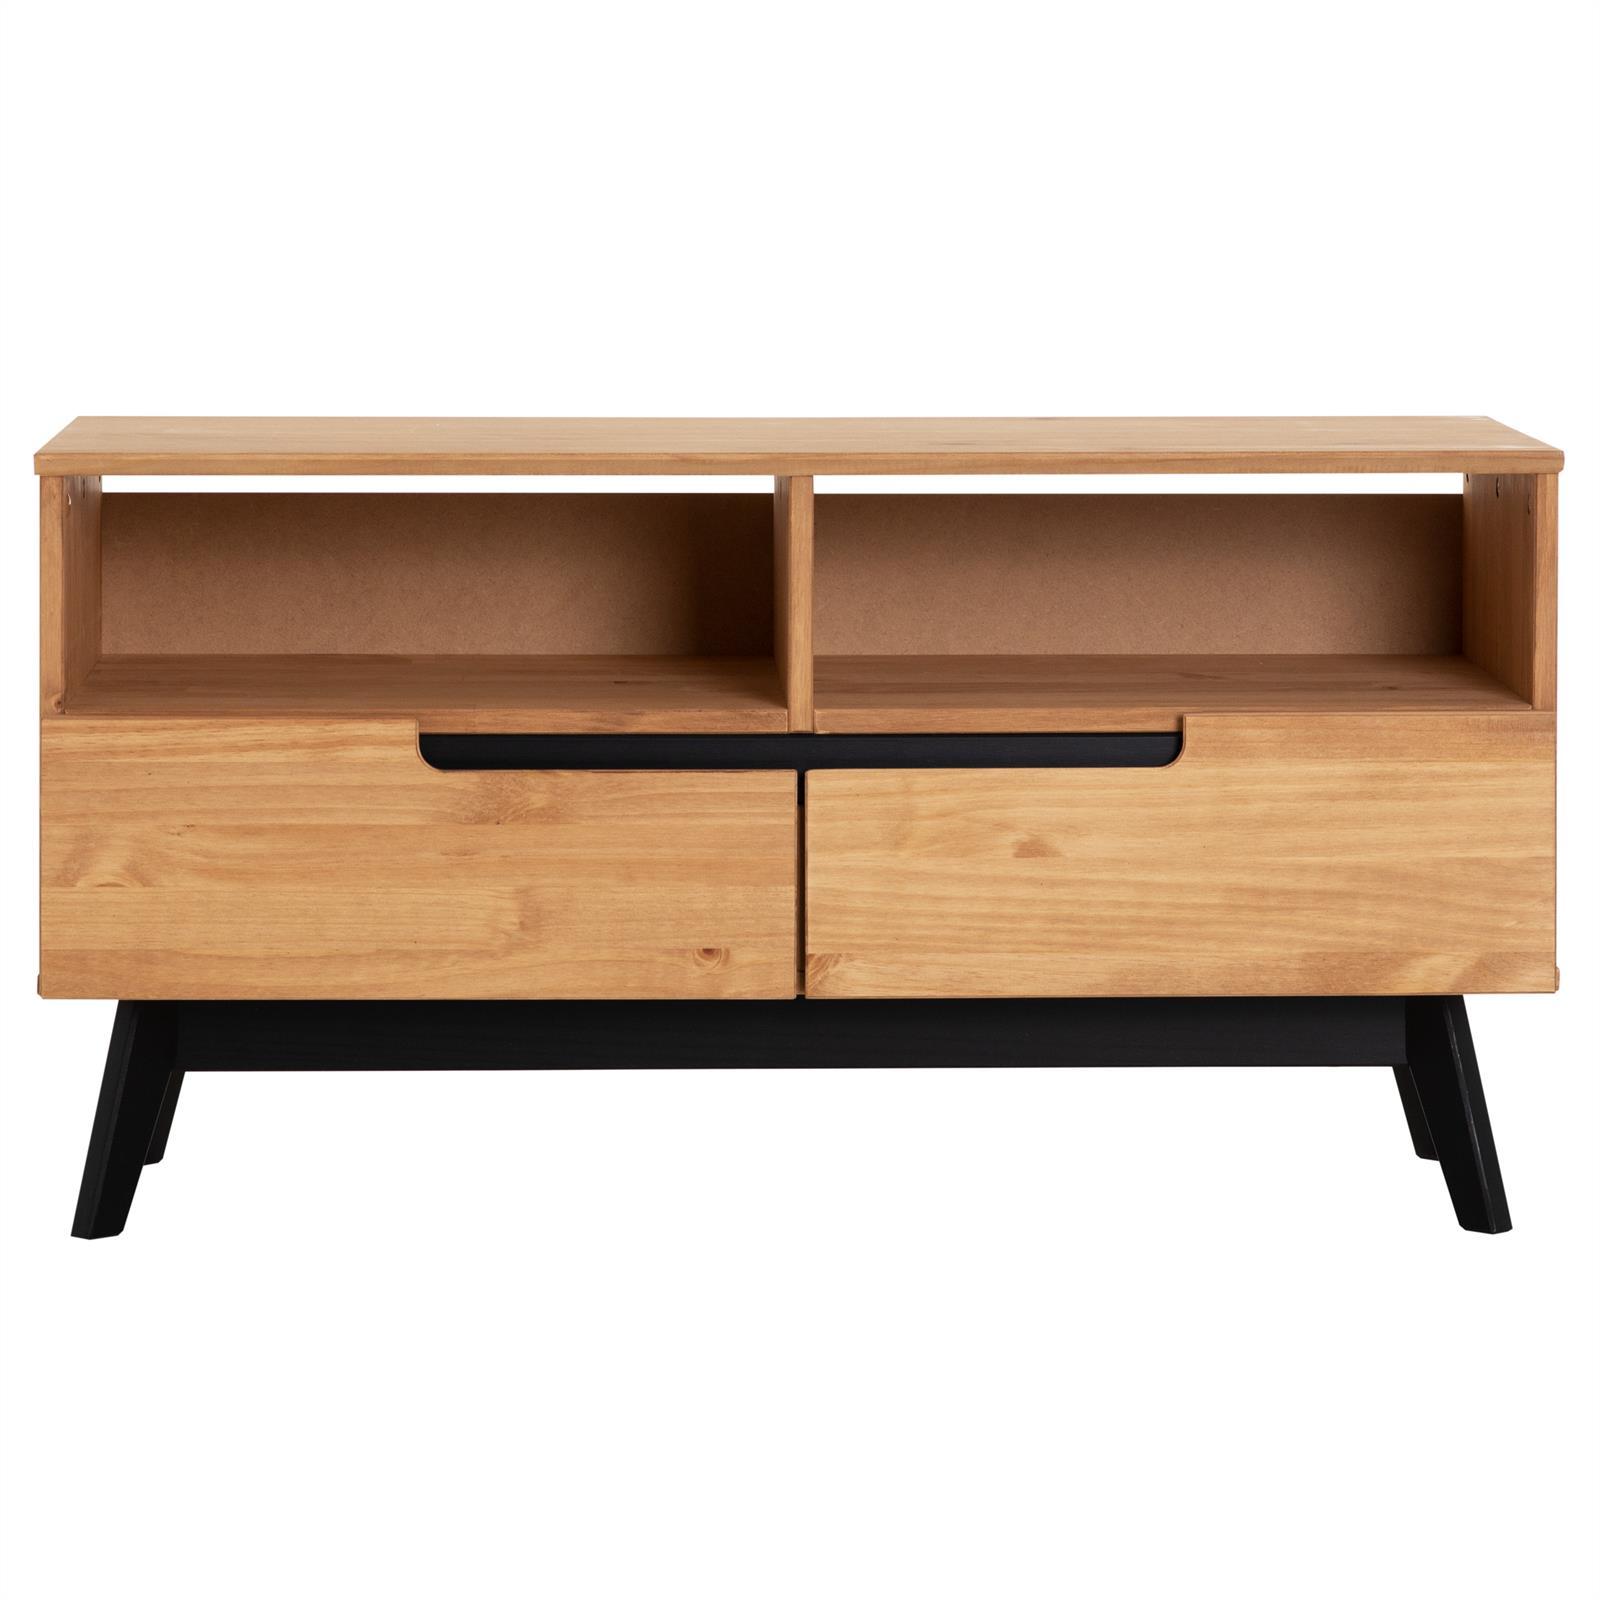 lowboard tv m bel fersehschrank fernsehm bel skandinavisch kiefer massiv ebay. Black Bedroom Furniture Sets. Home Design Ideas